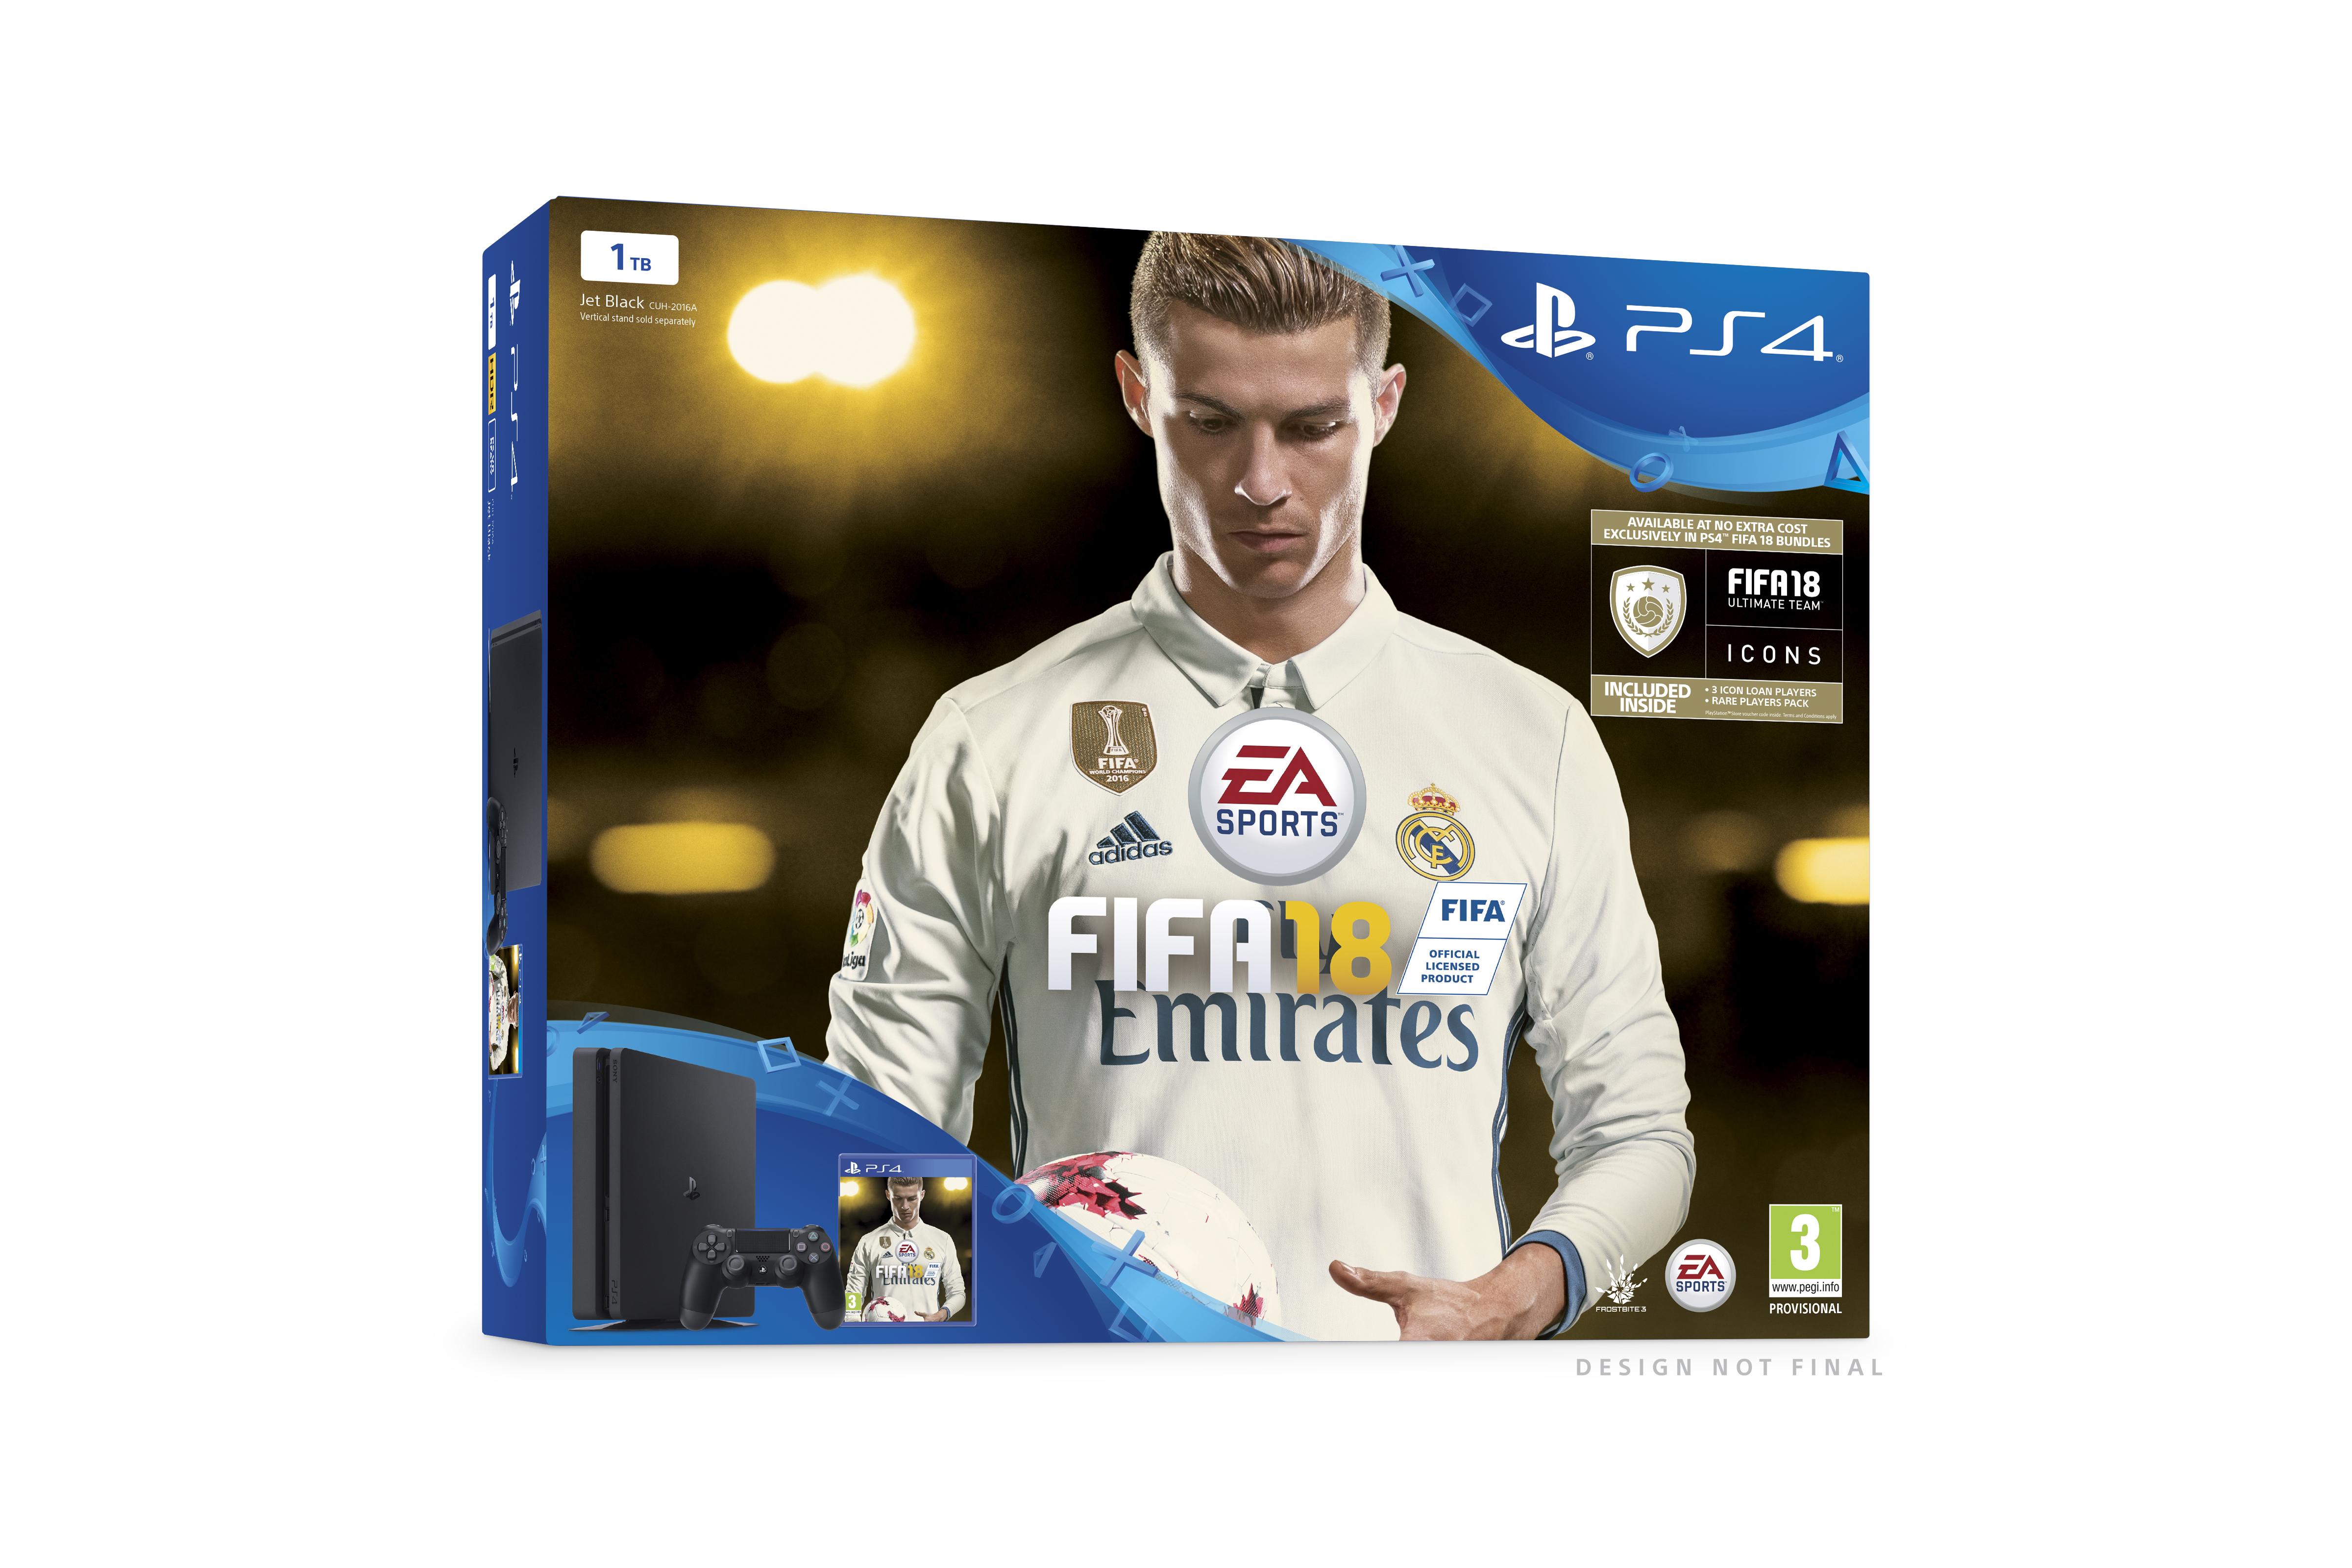 1Tb_Icon_3D_FIFA 18_PEGI